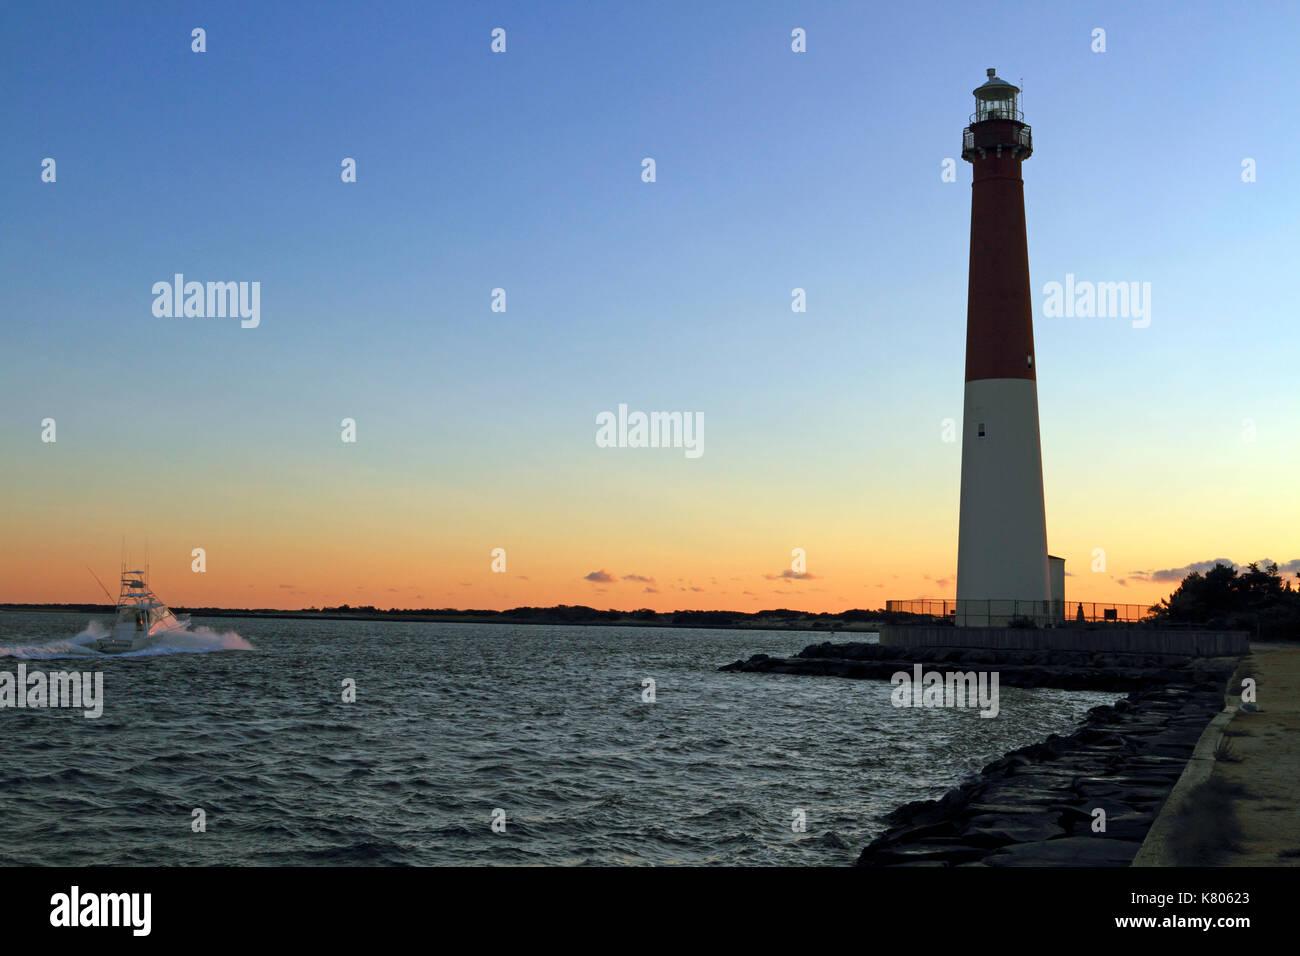 Beach Haven Large additionally Barnegat Lighthouse Long Beach Island New Jersey Usa K Yh also Px Nj Lbi Lighthouse A June likewise Barnegat Lighthouse Long Beach Island New Jersey Usa K likewise Px Nj Lbi Sunset. on barnegat lighthouse long beach island nj